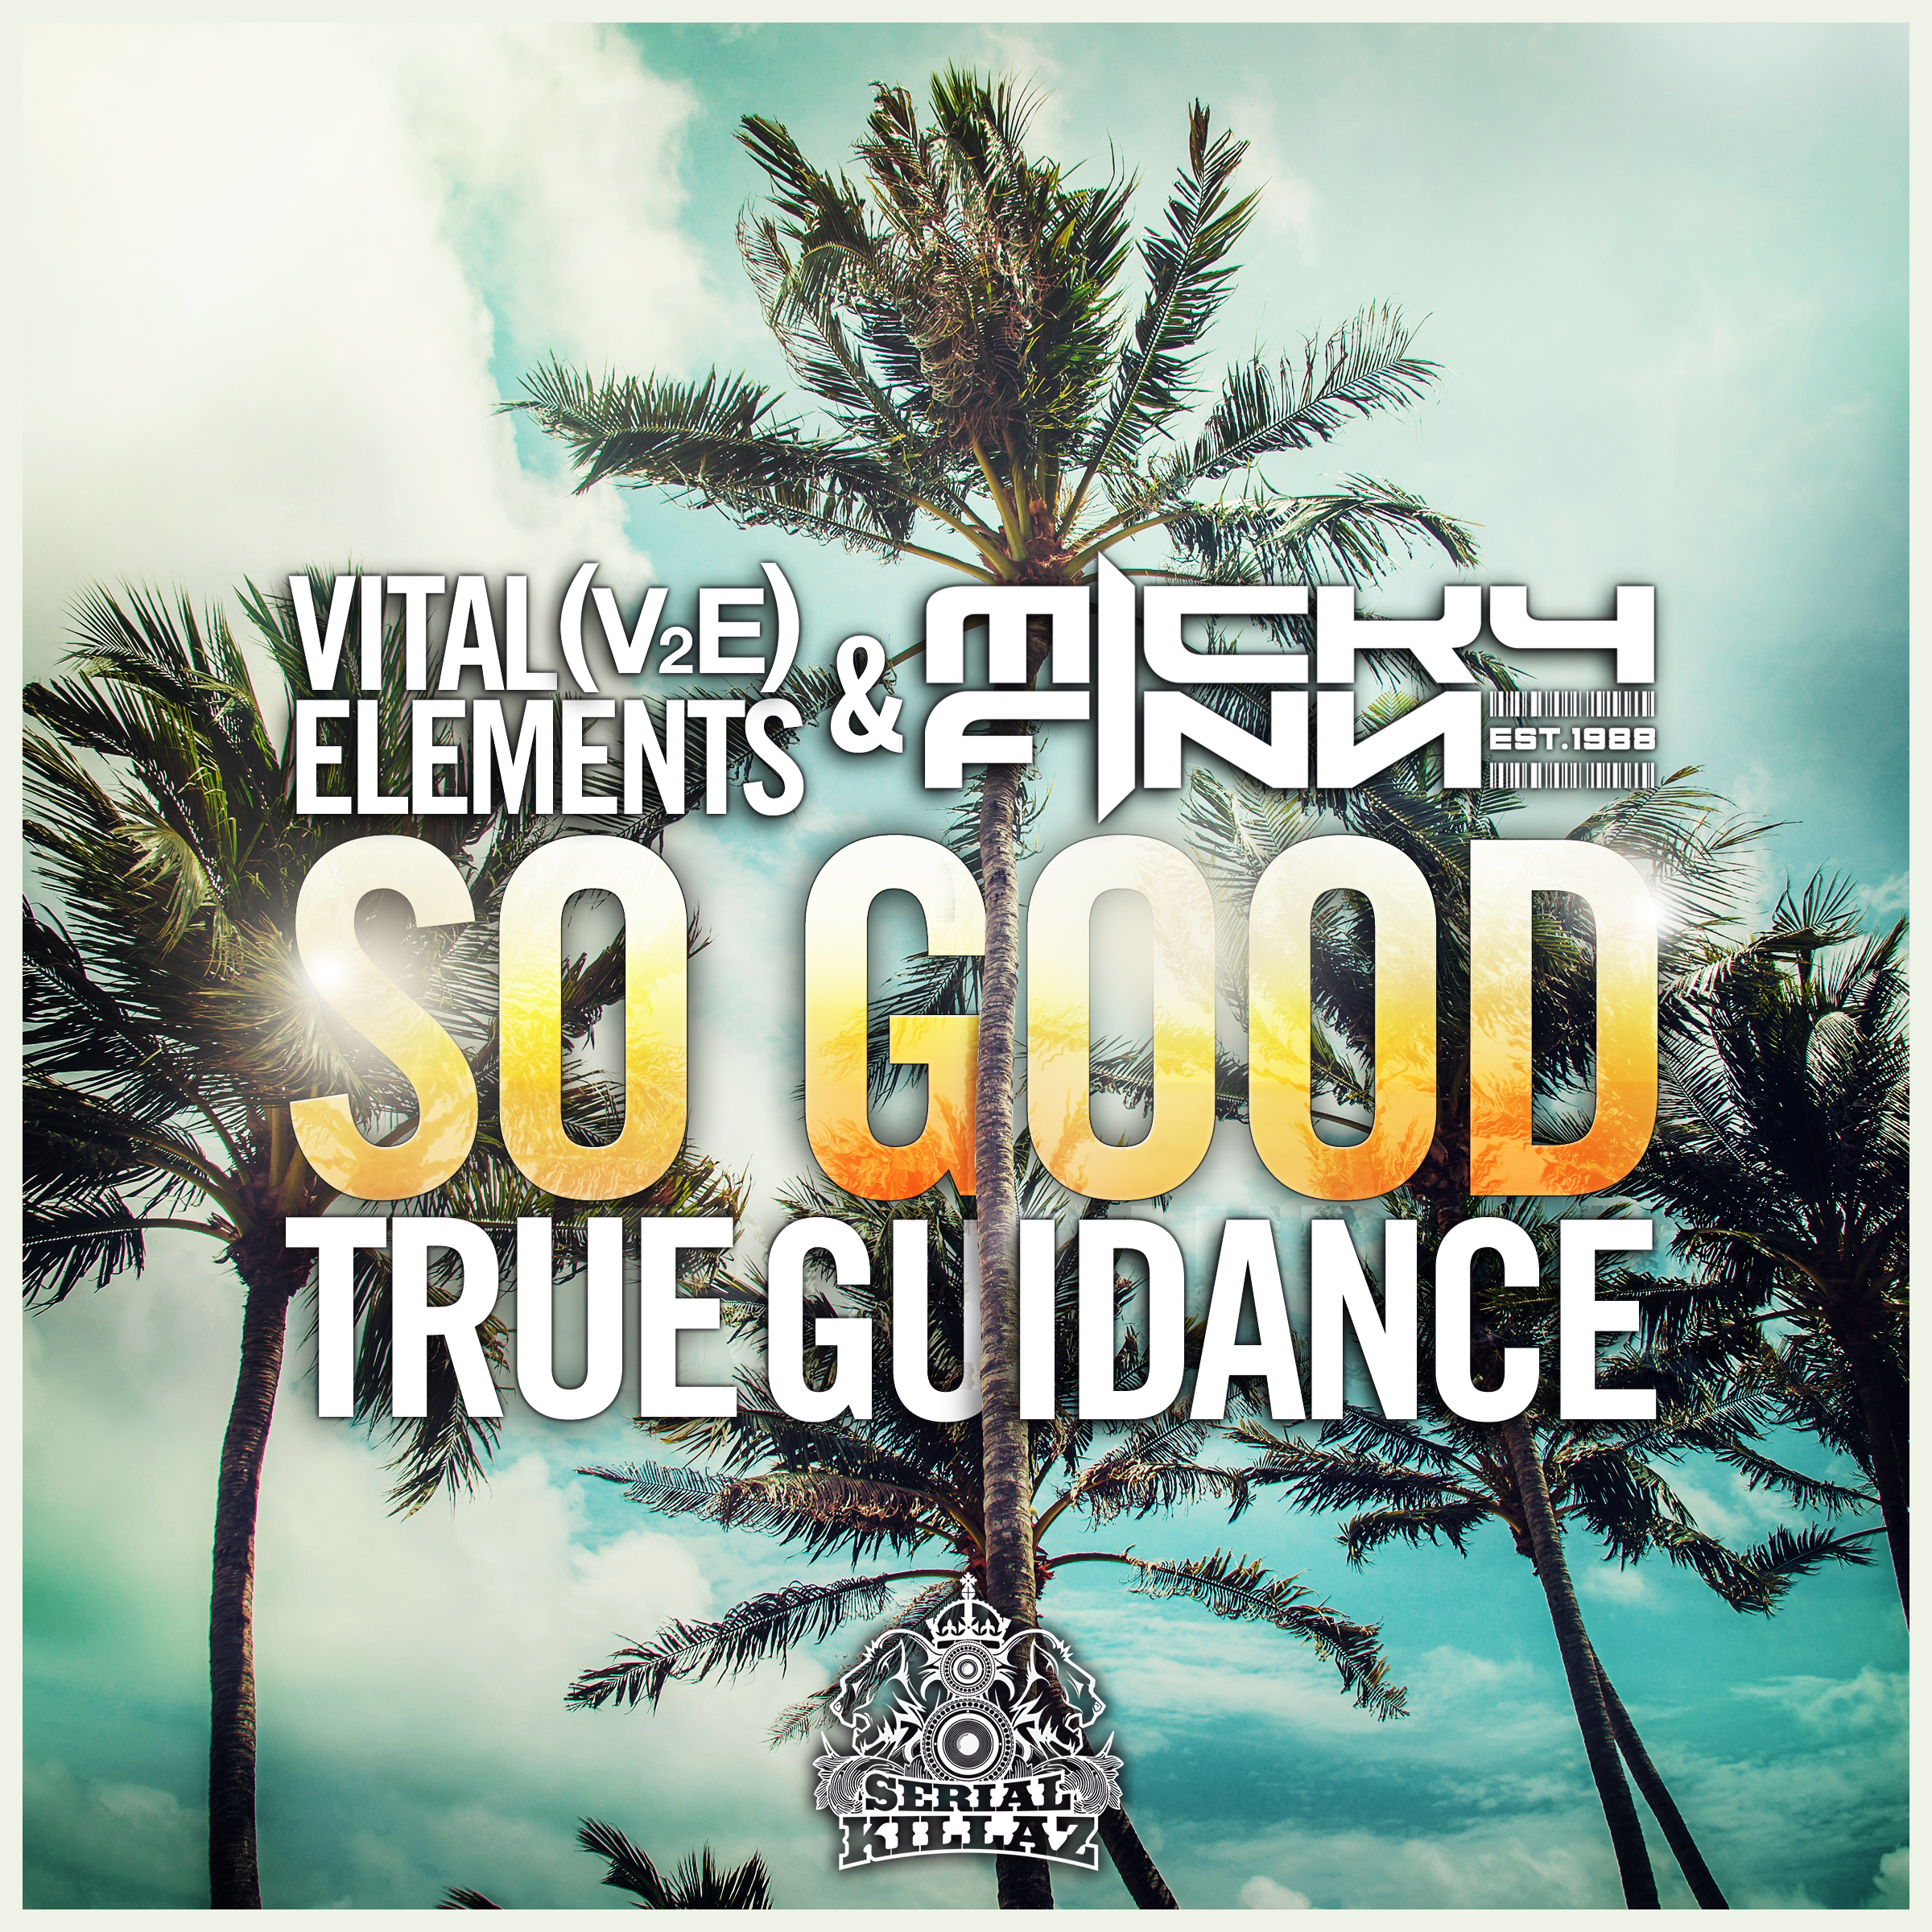 Vital Elements & Micky Finn - So Good / True Guidance